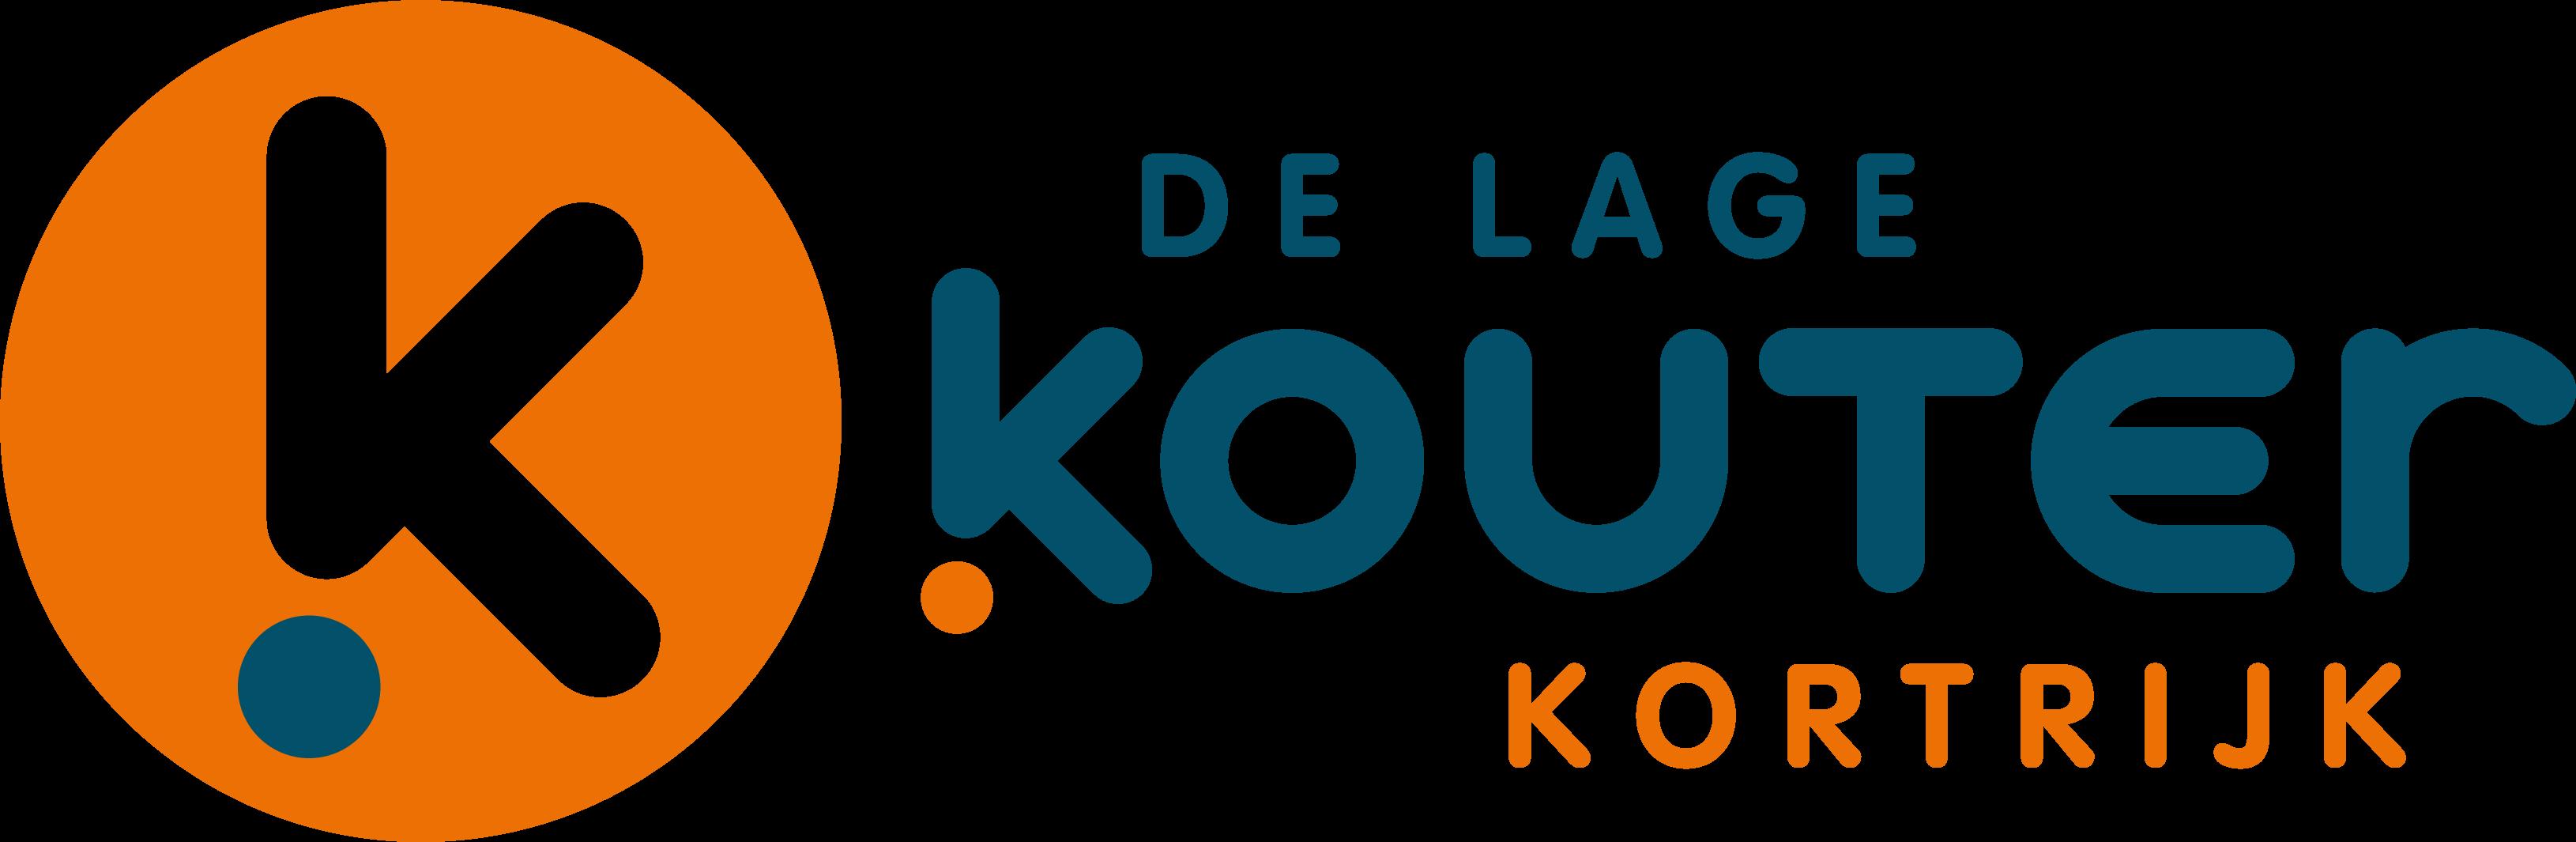 Logo De Lage Kouter Kortrijk